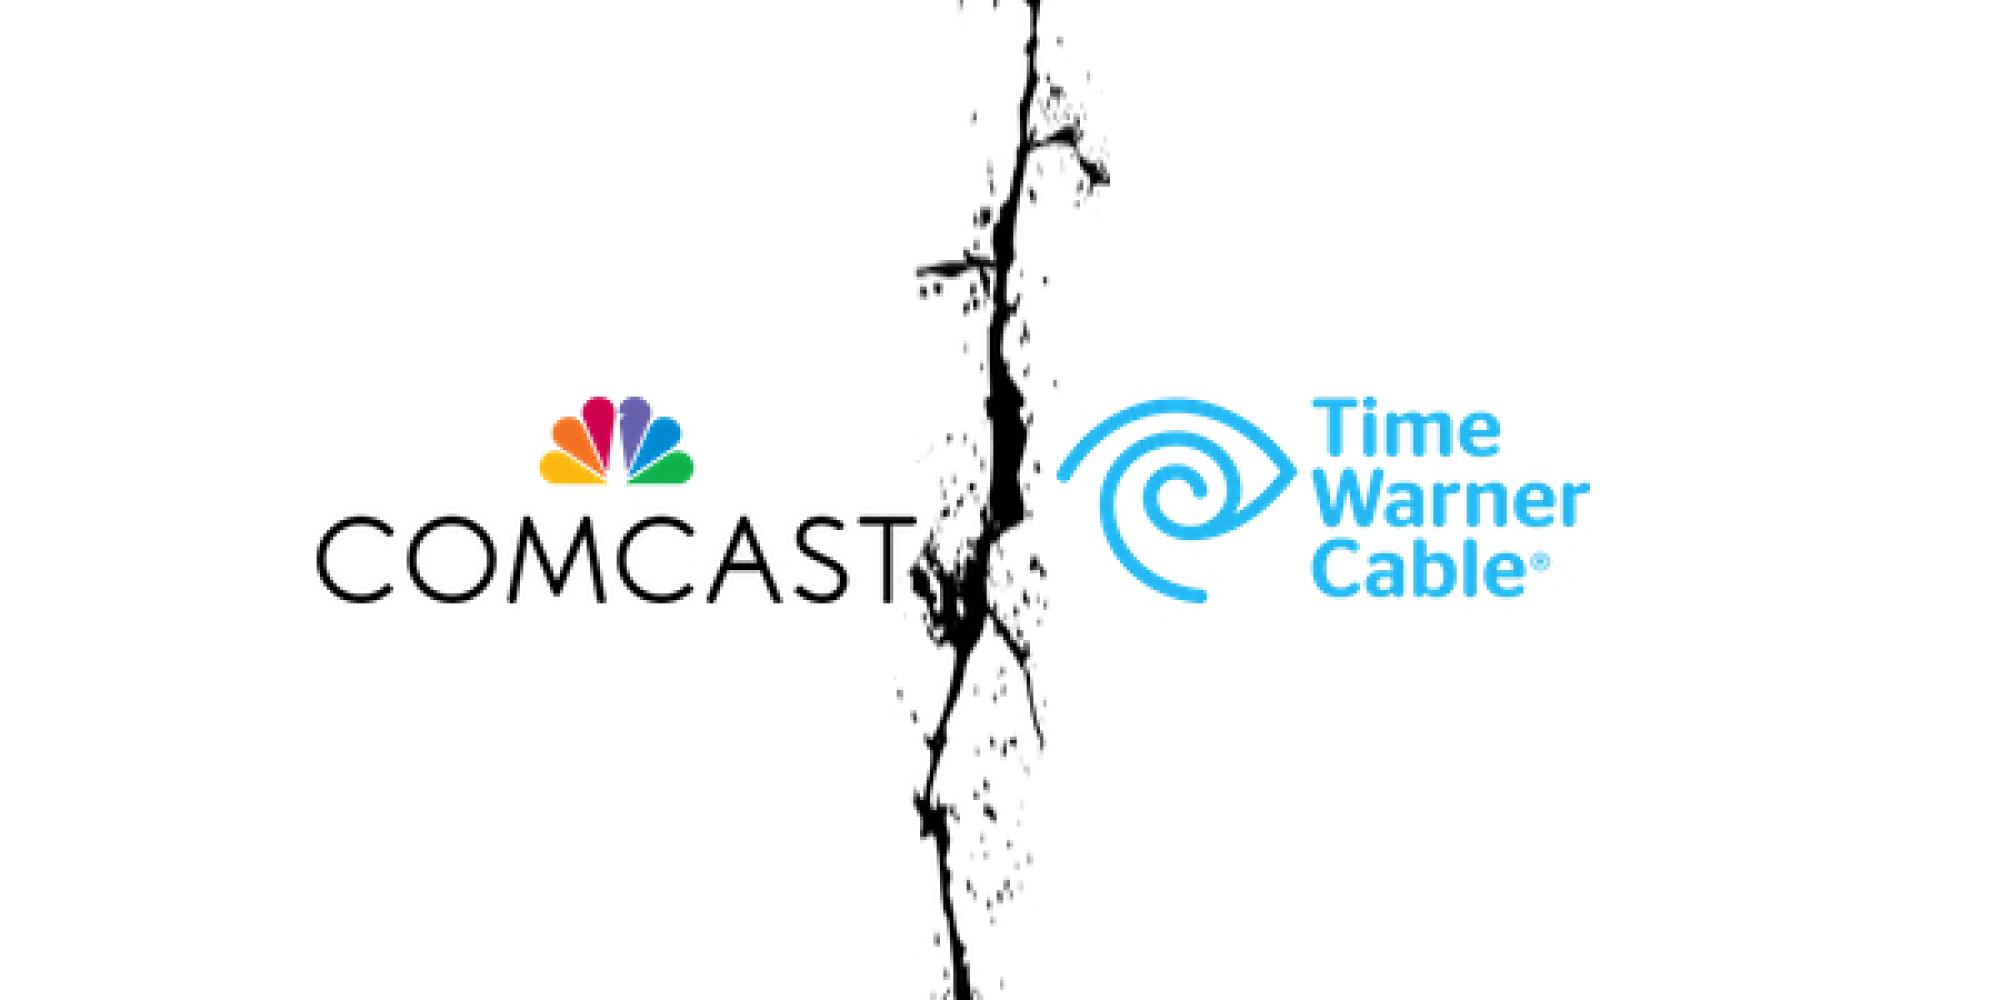 Comcast Calls Off Time Warner Cable Merger